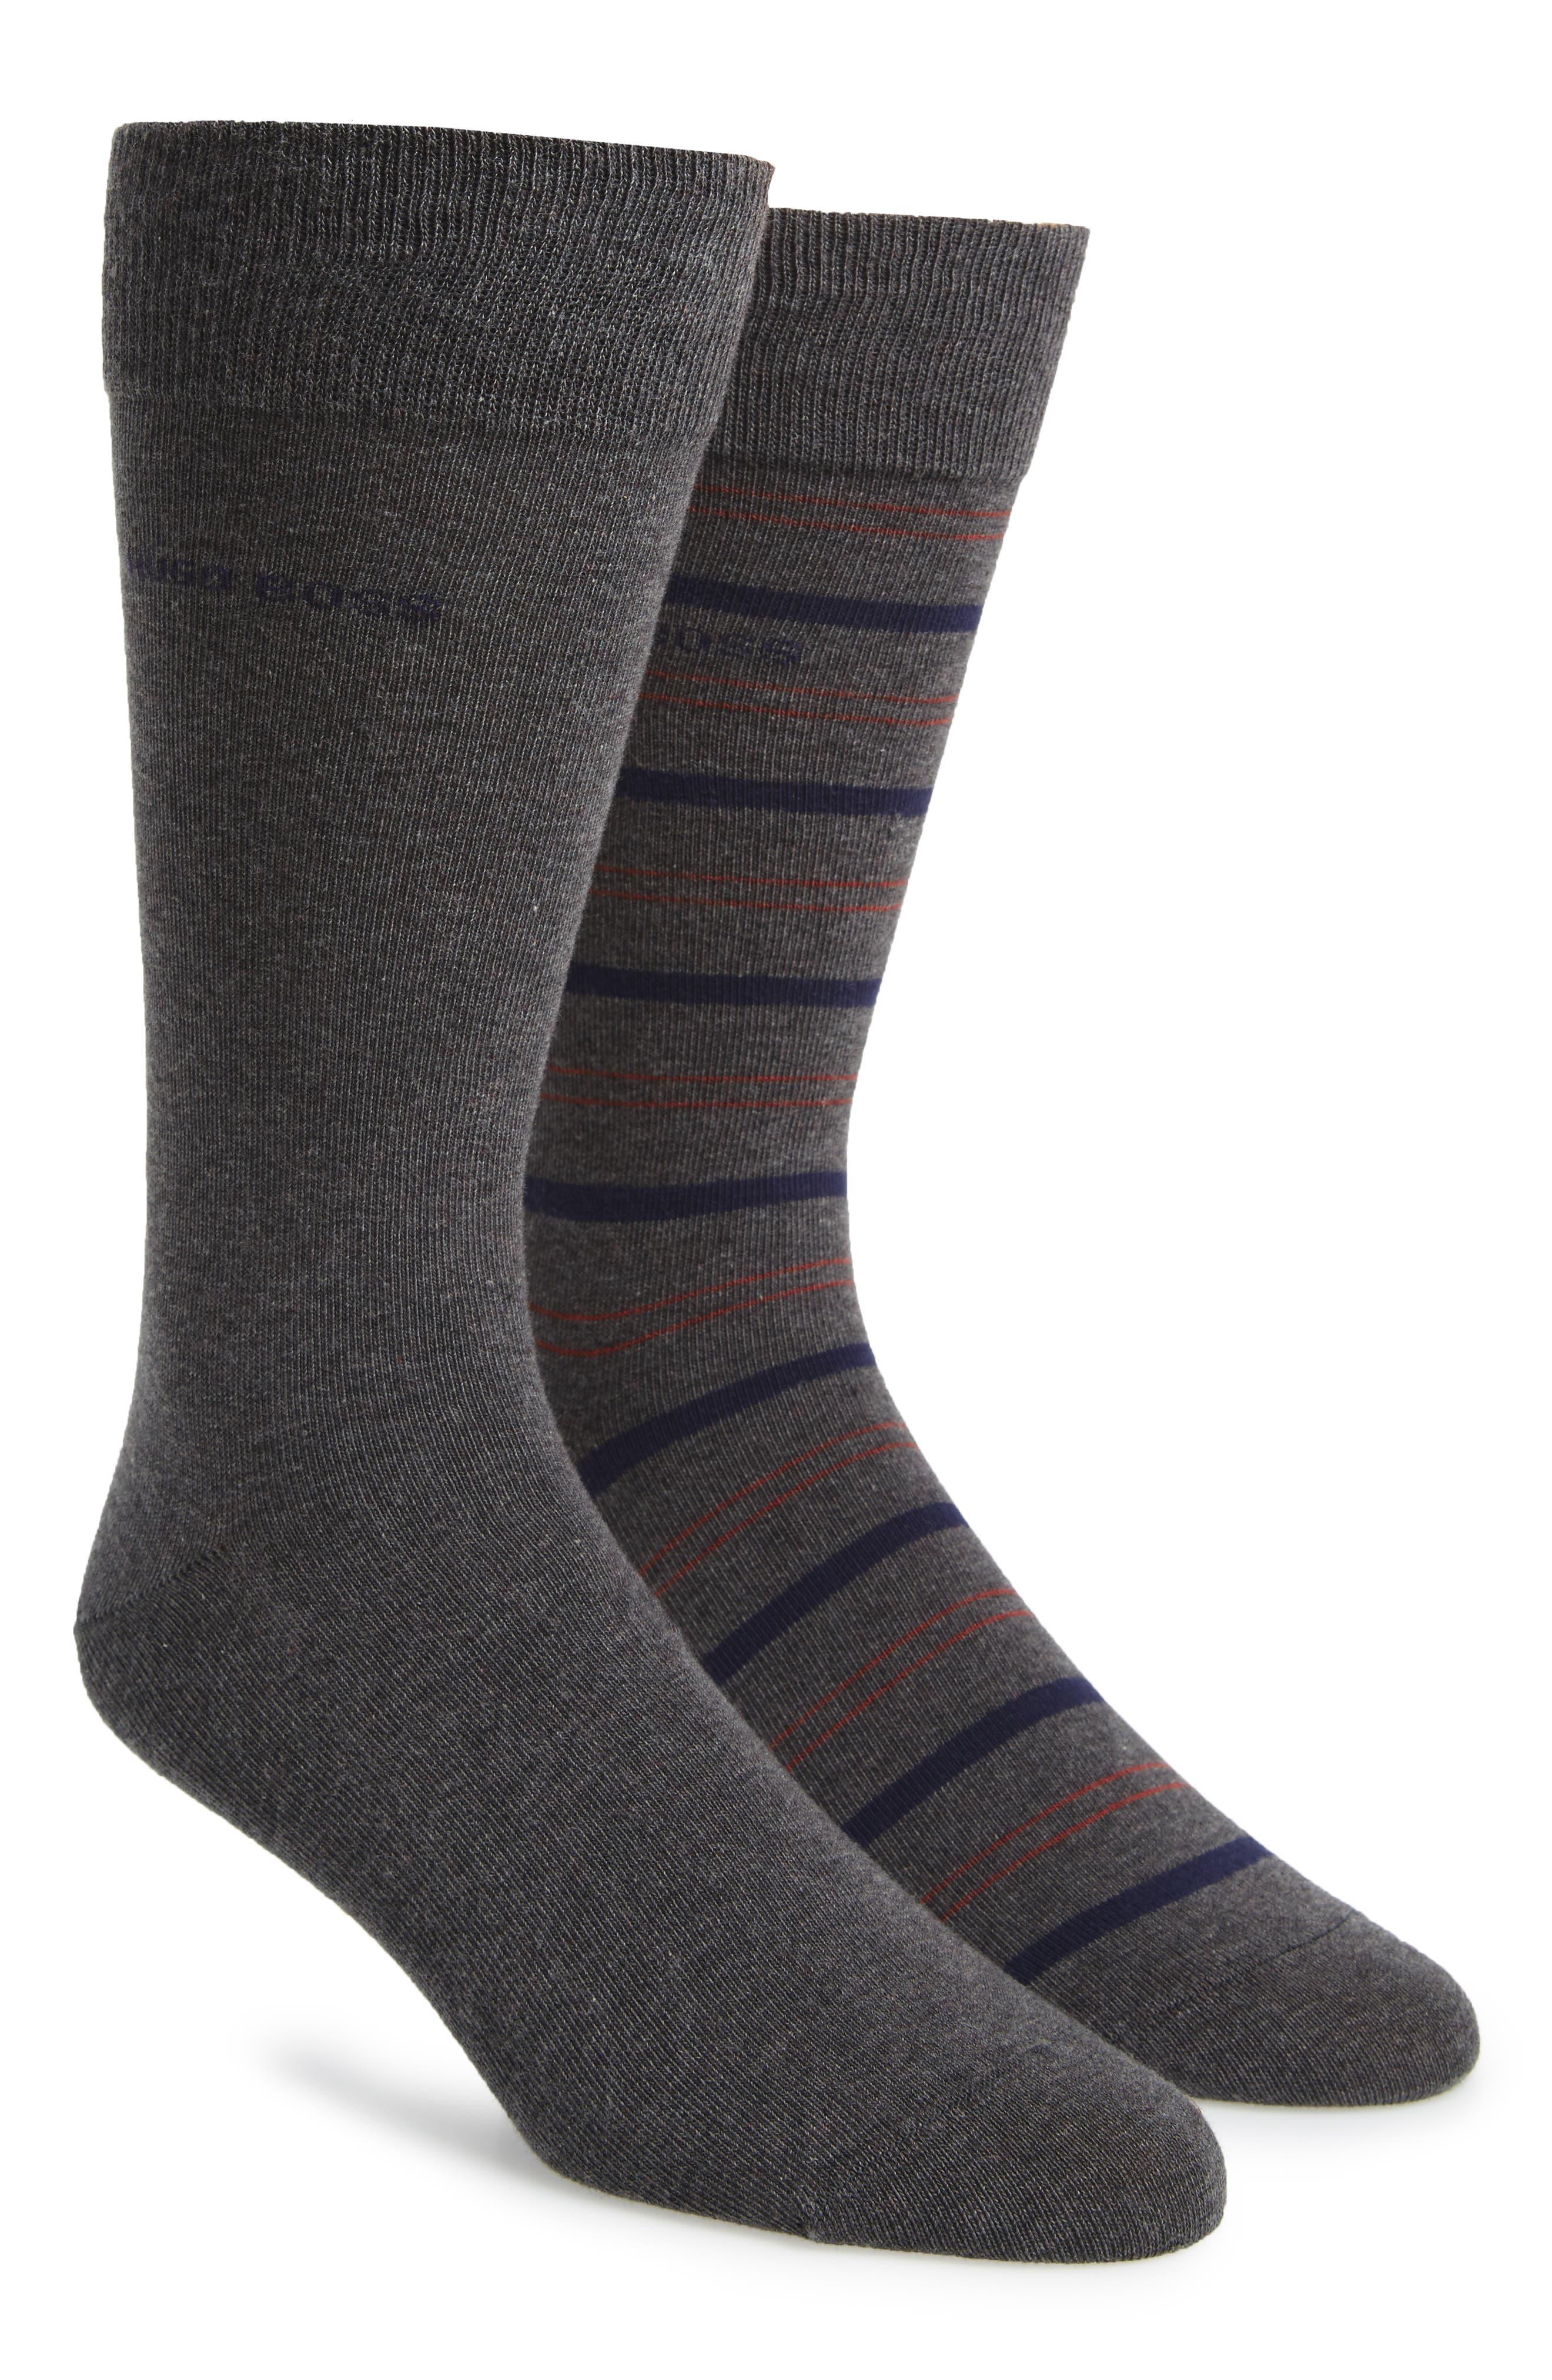 2-Pack Socks,                             Main thumbnail 1, color,                             031